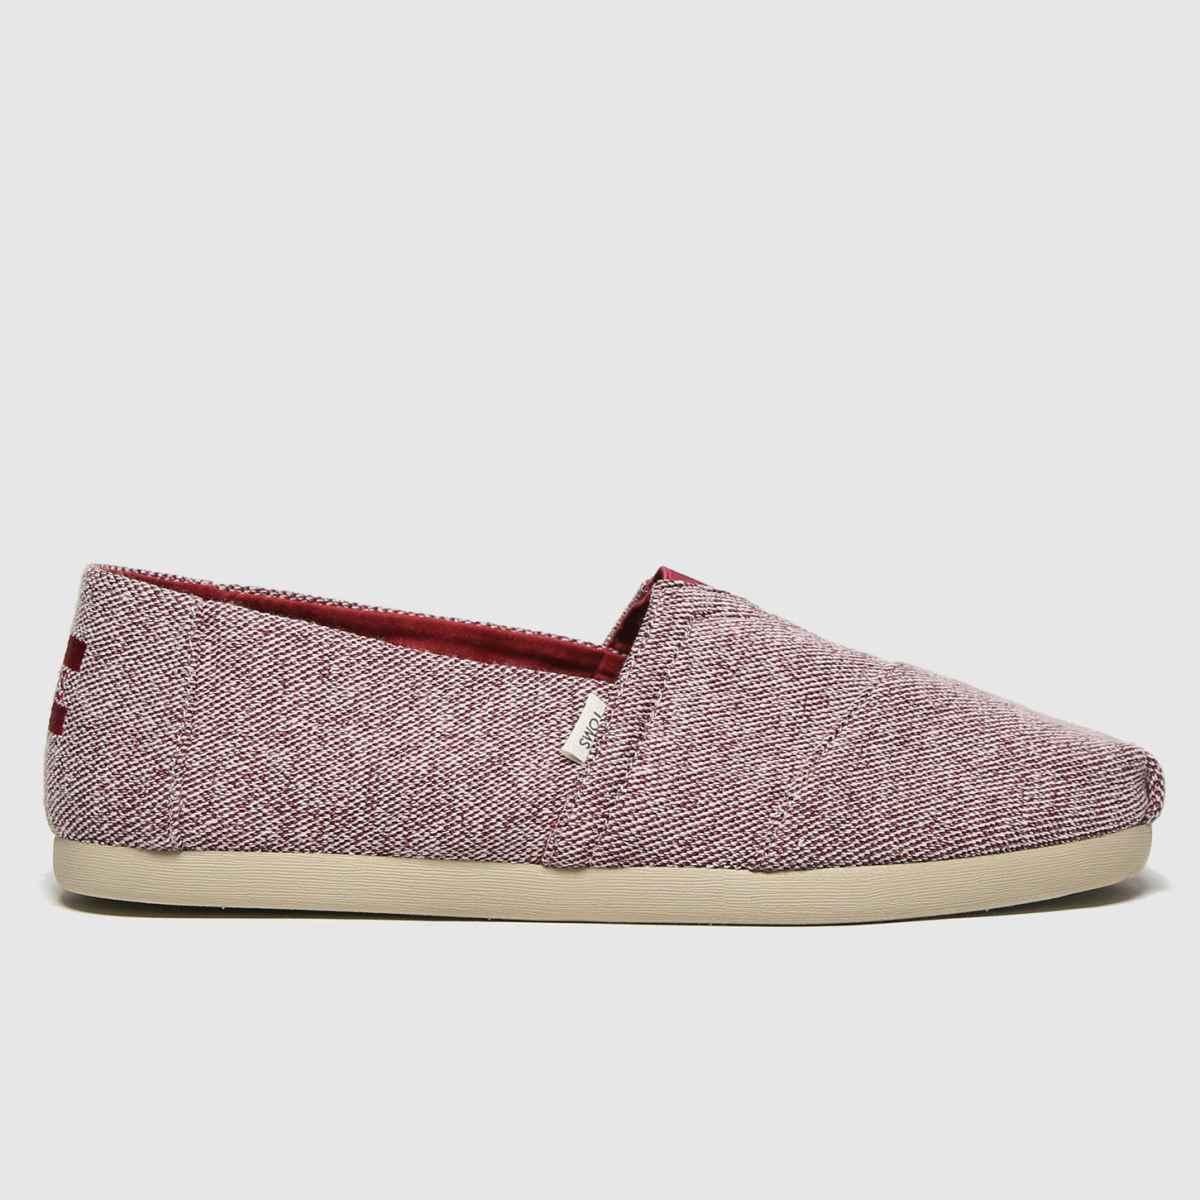 Toms Red Alpargata 3.0 Repreve Shoes